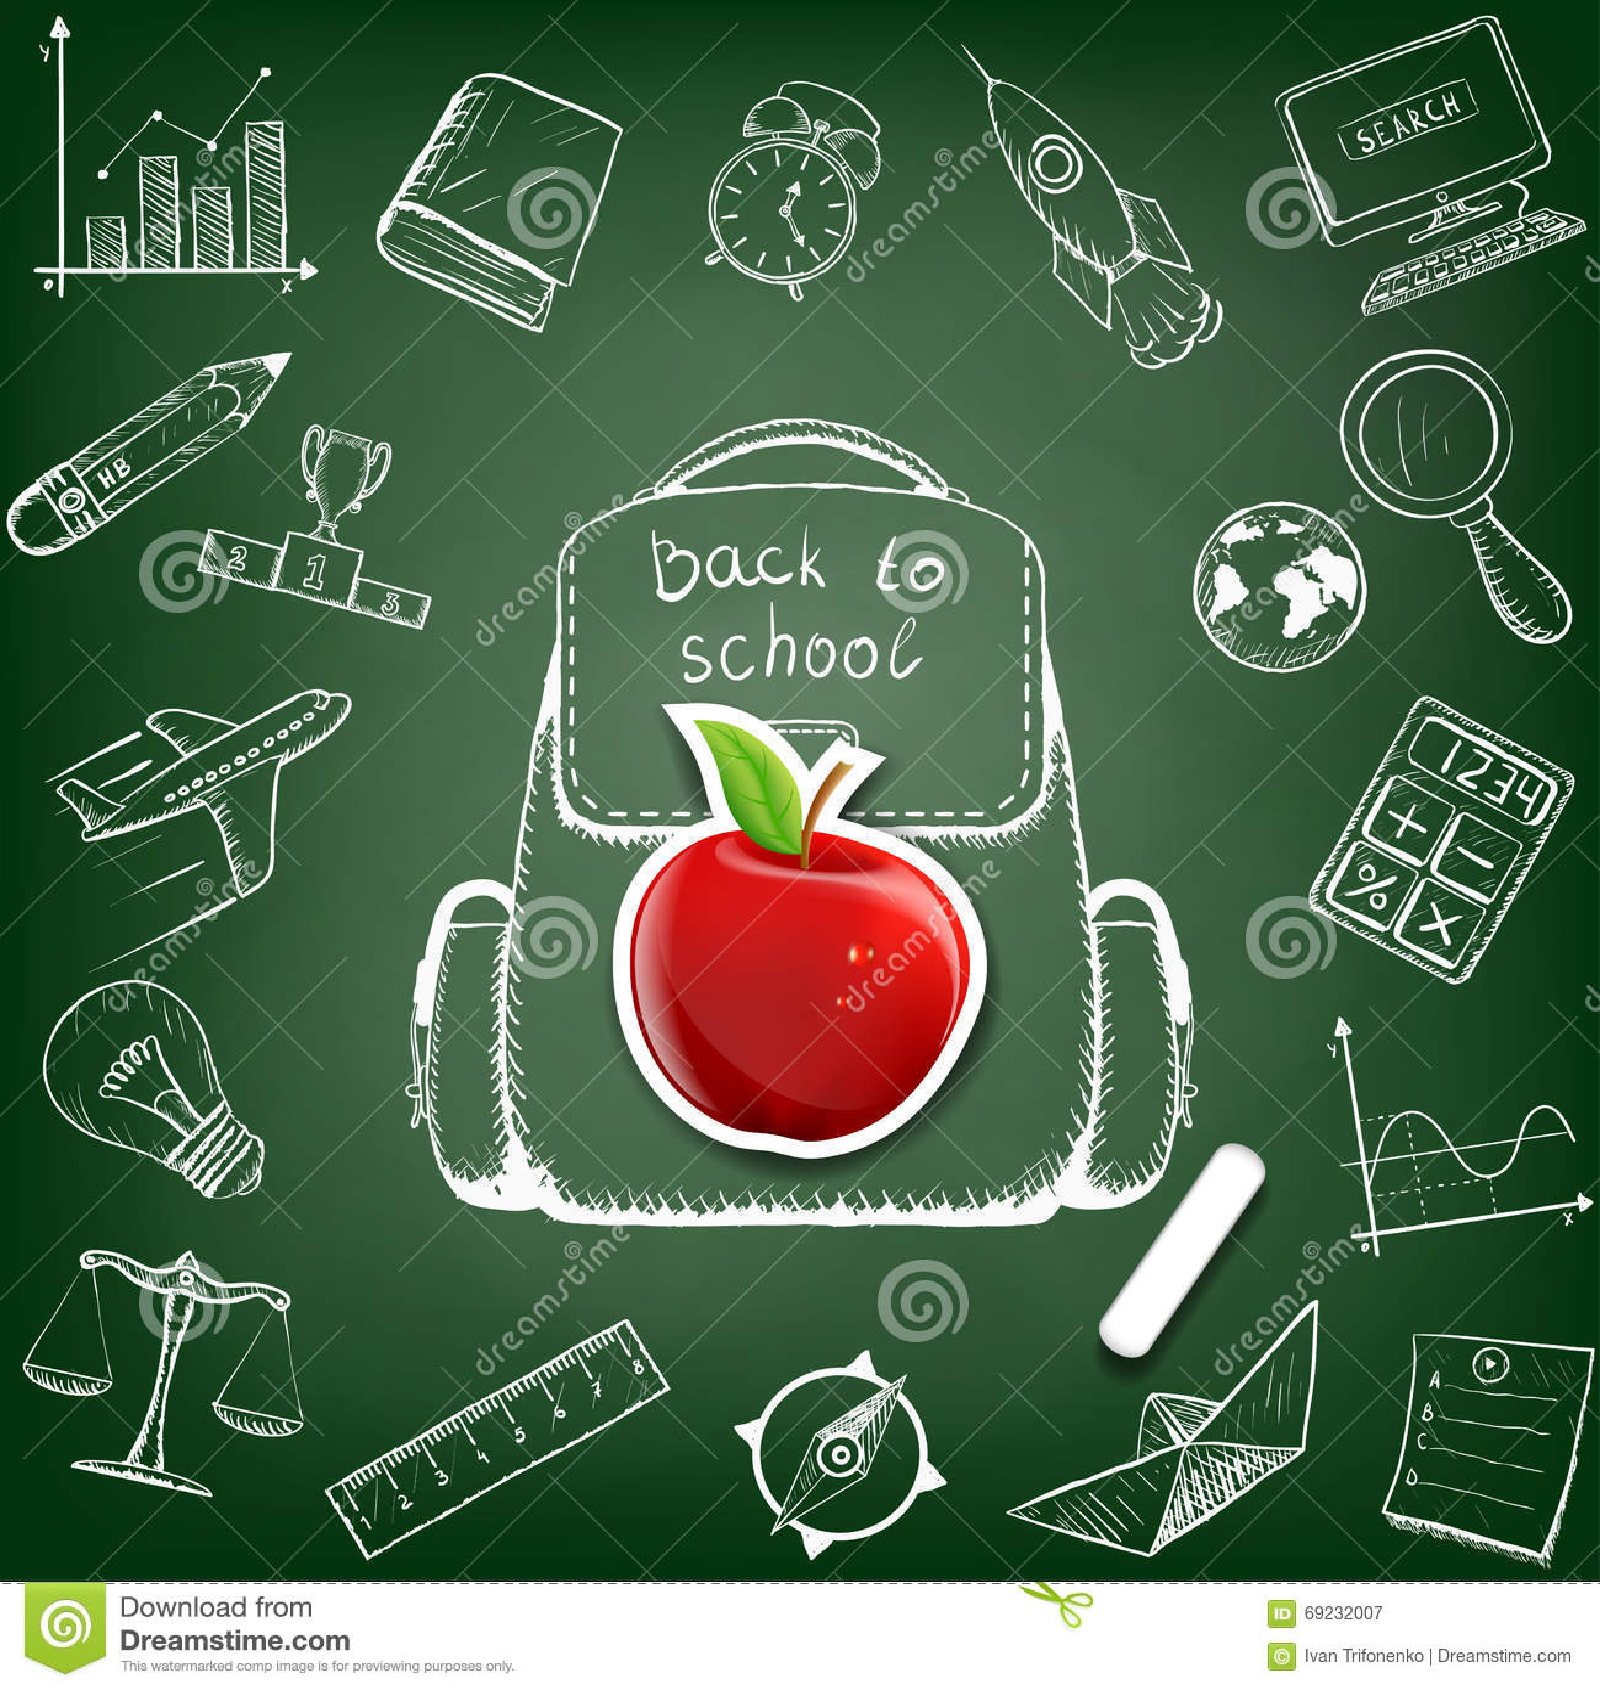 School bag diagram - School Bag Doodle Image